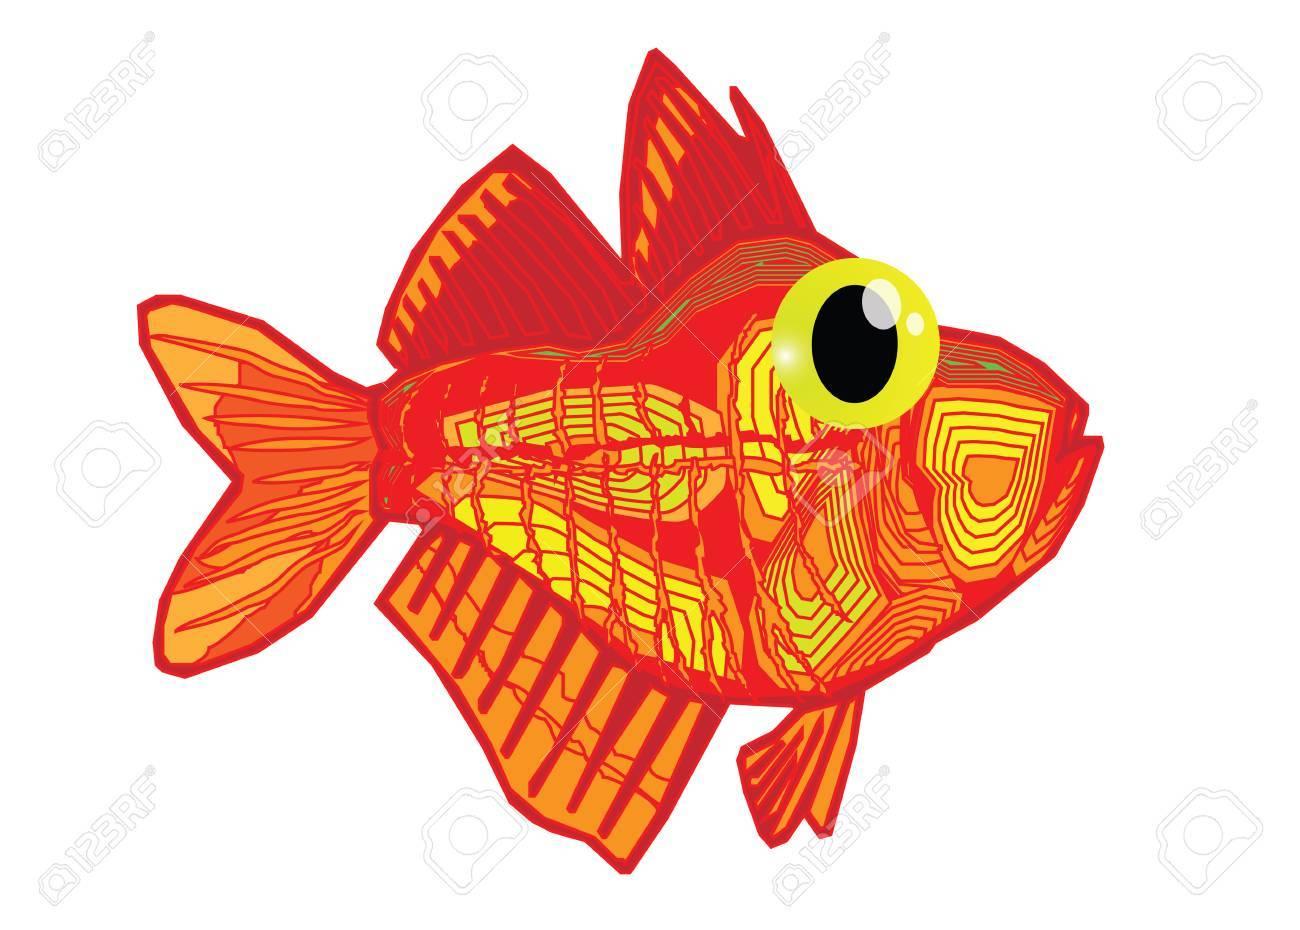 Funny Fish Cartoon Royalty Free Cliparts, Vectors, And Stock ...